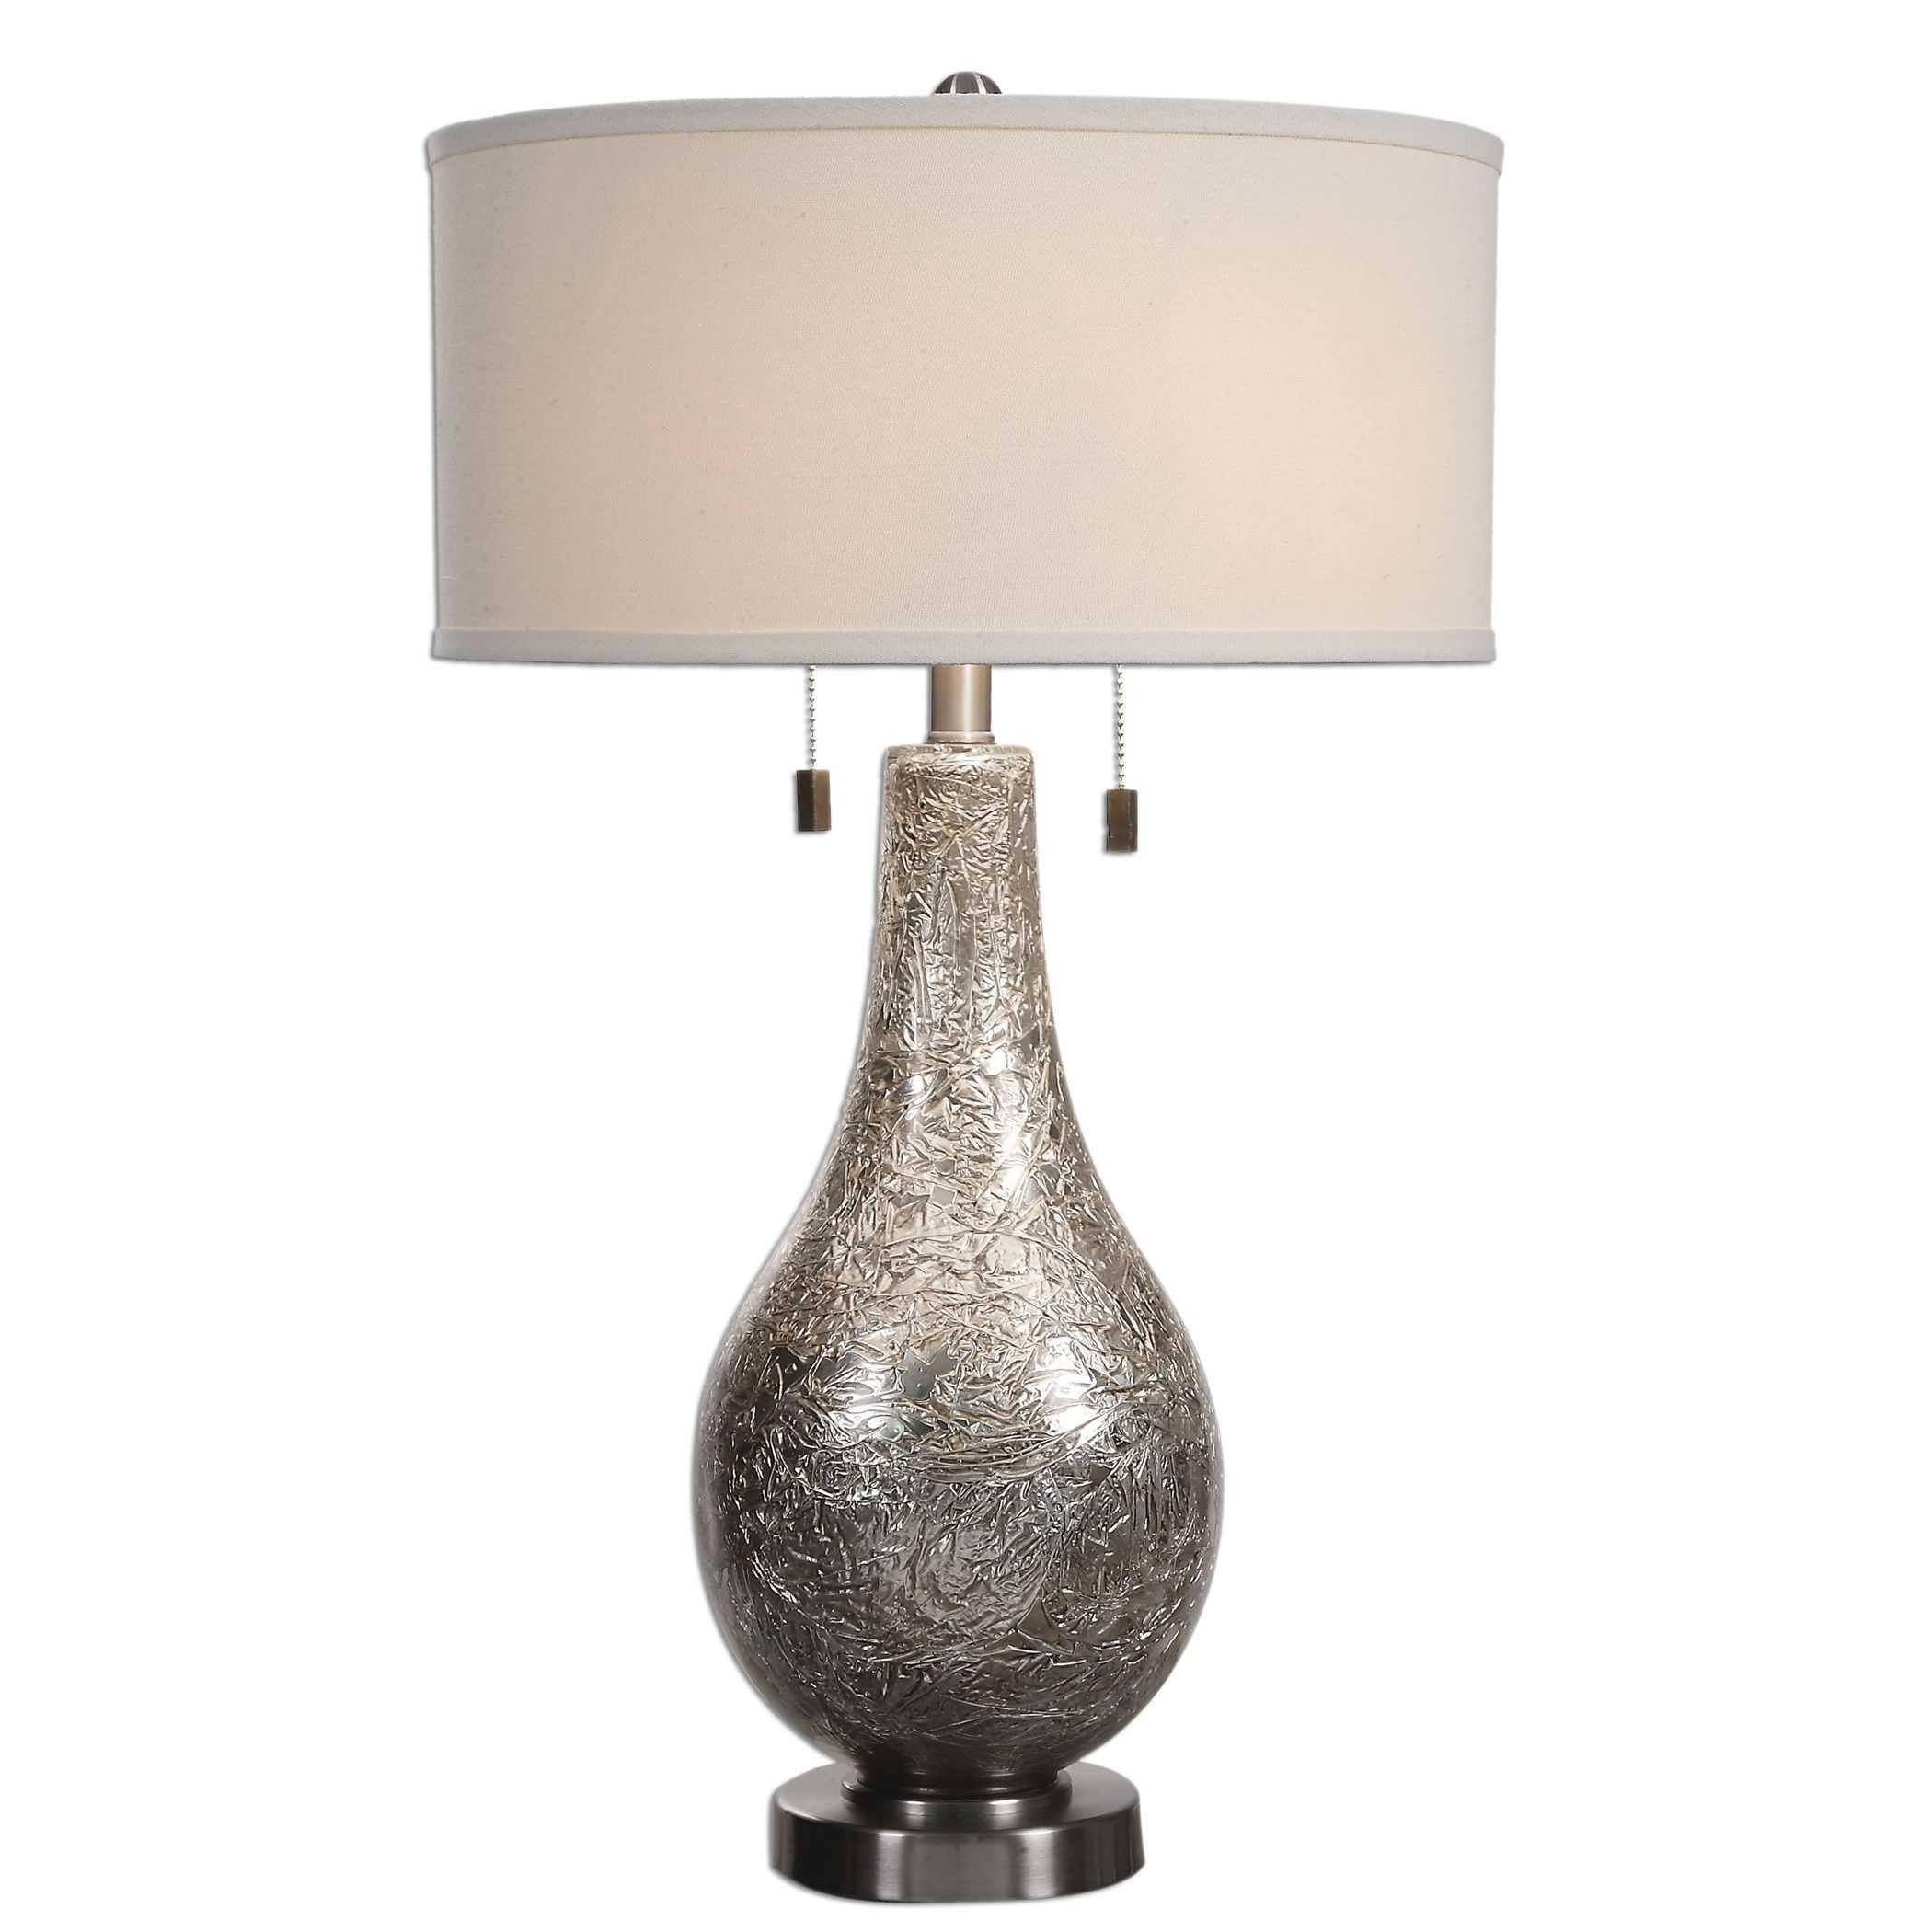 Uttermost Saracena Mercury Glass Lamp